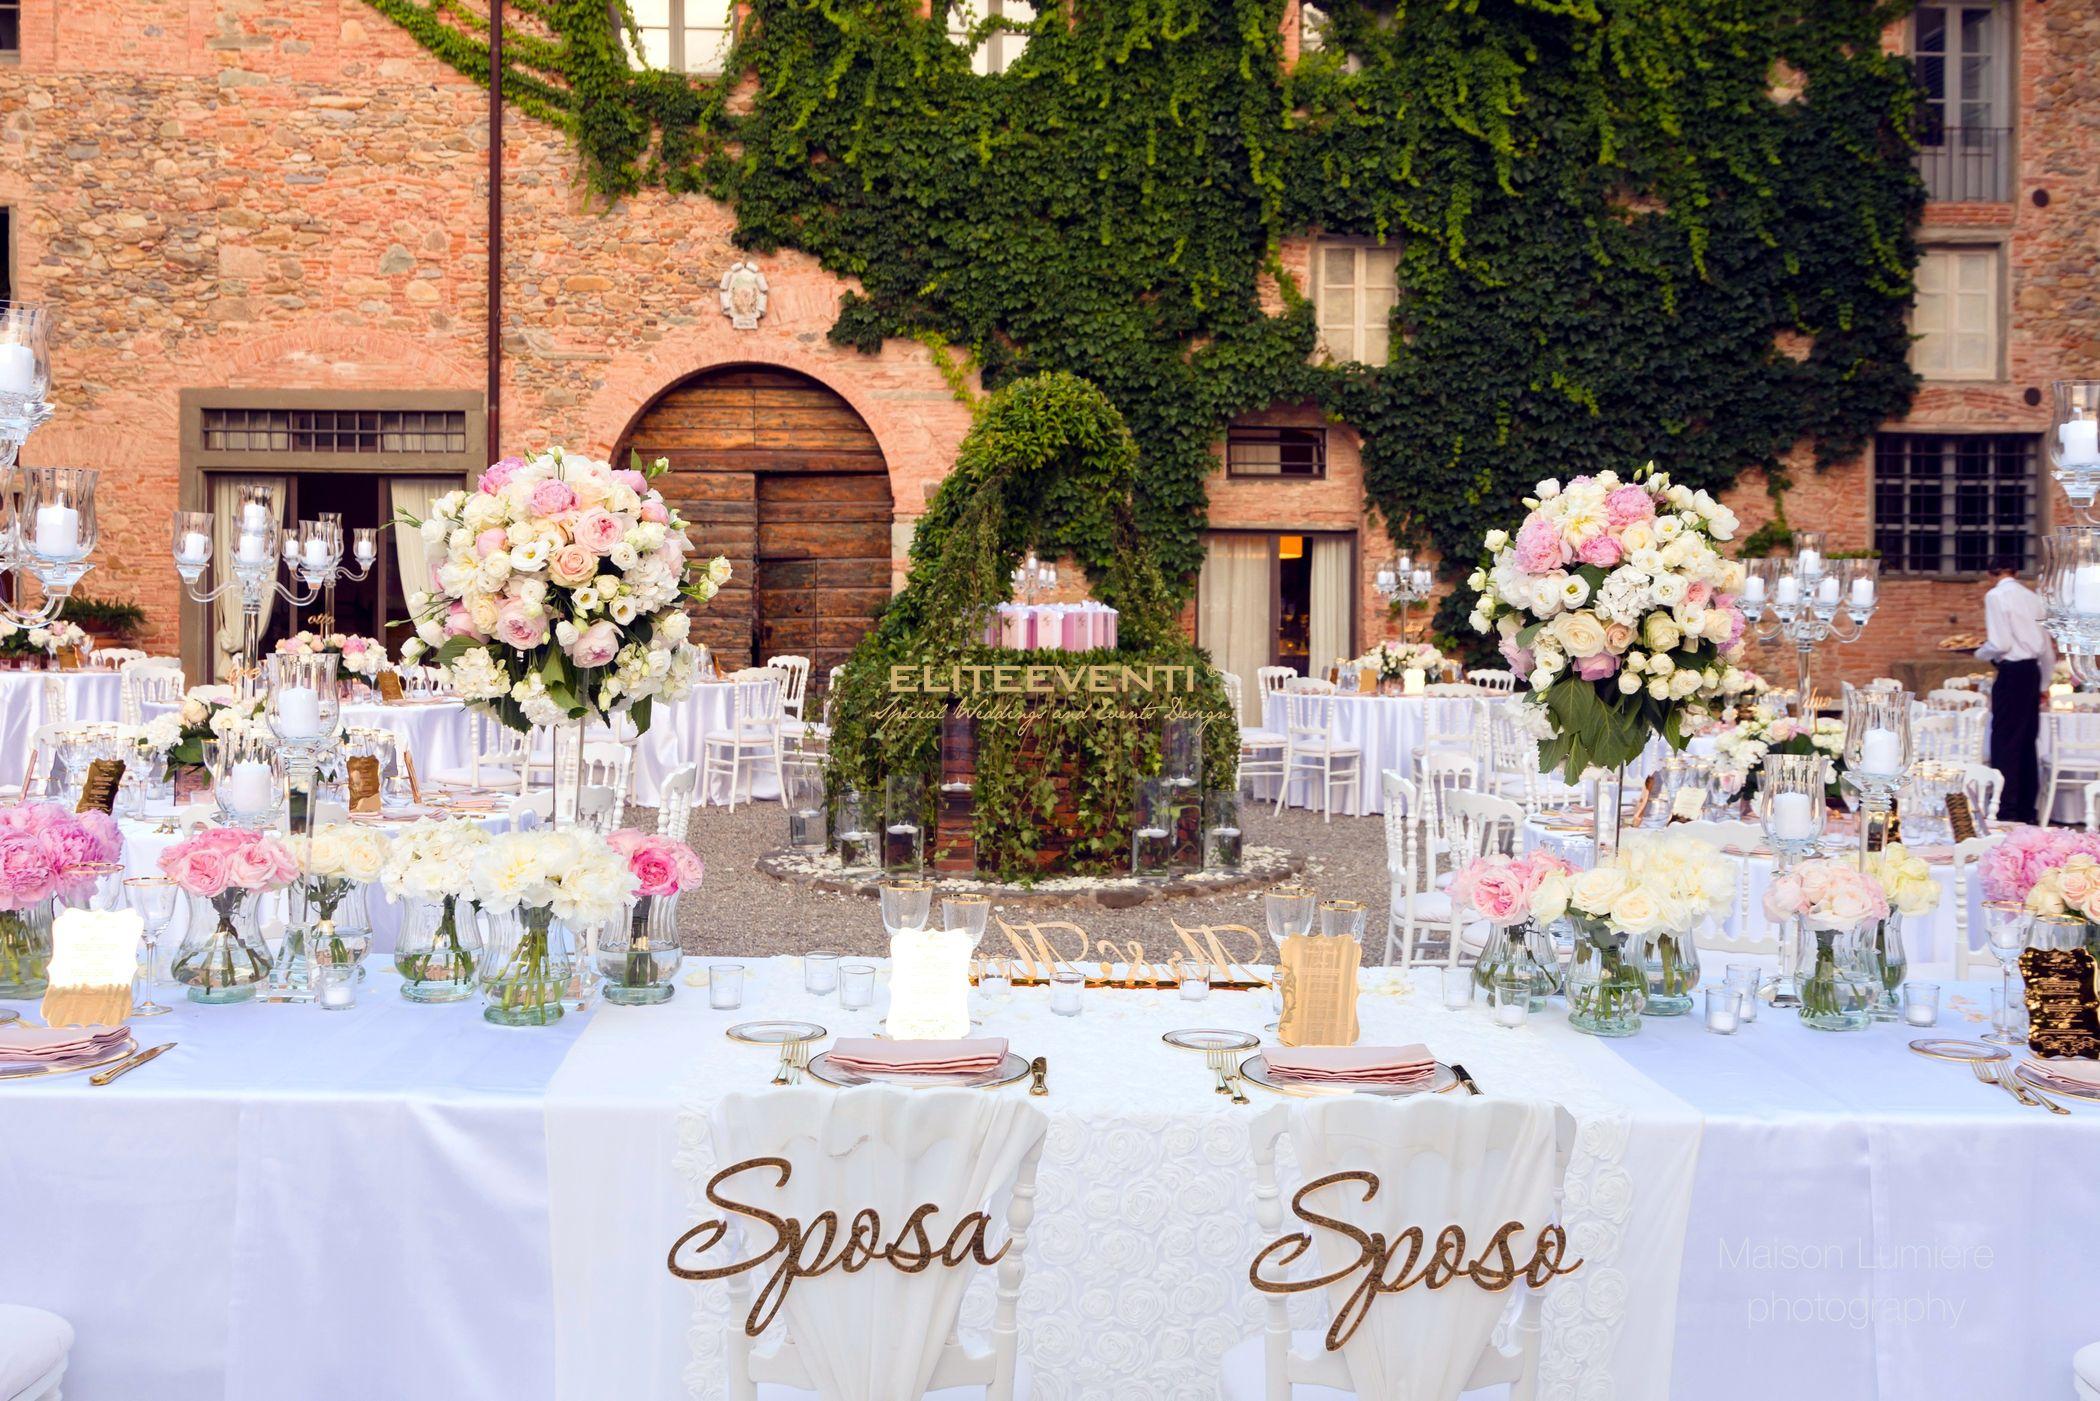 Eliteeventi Special Wedding and Events Design